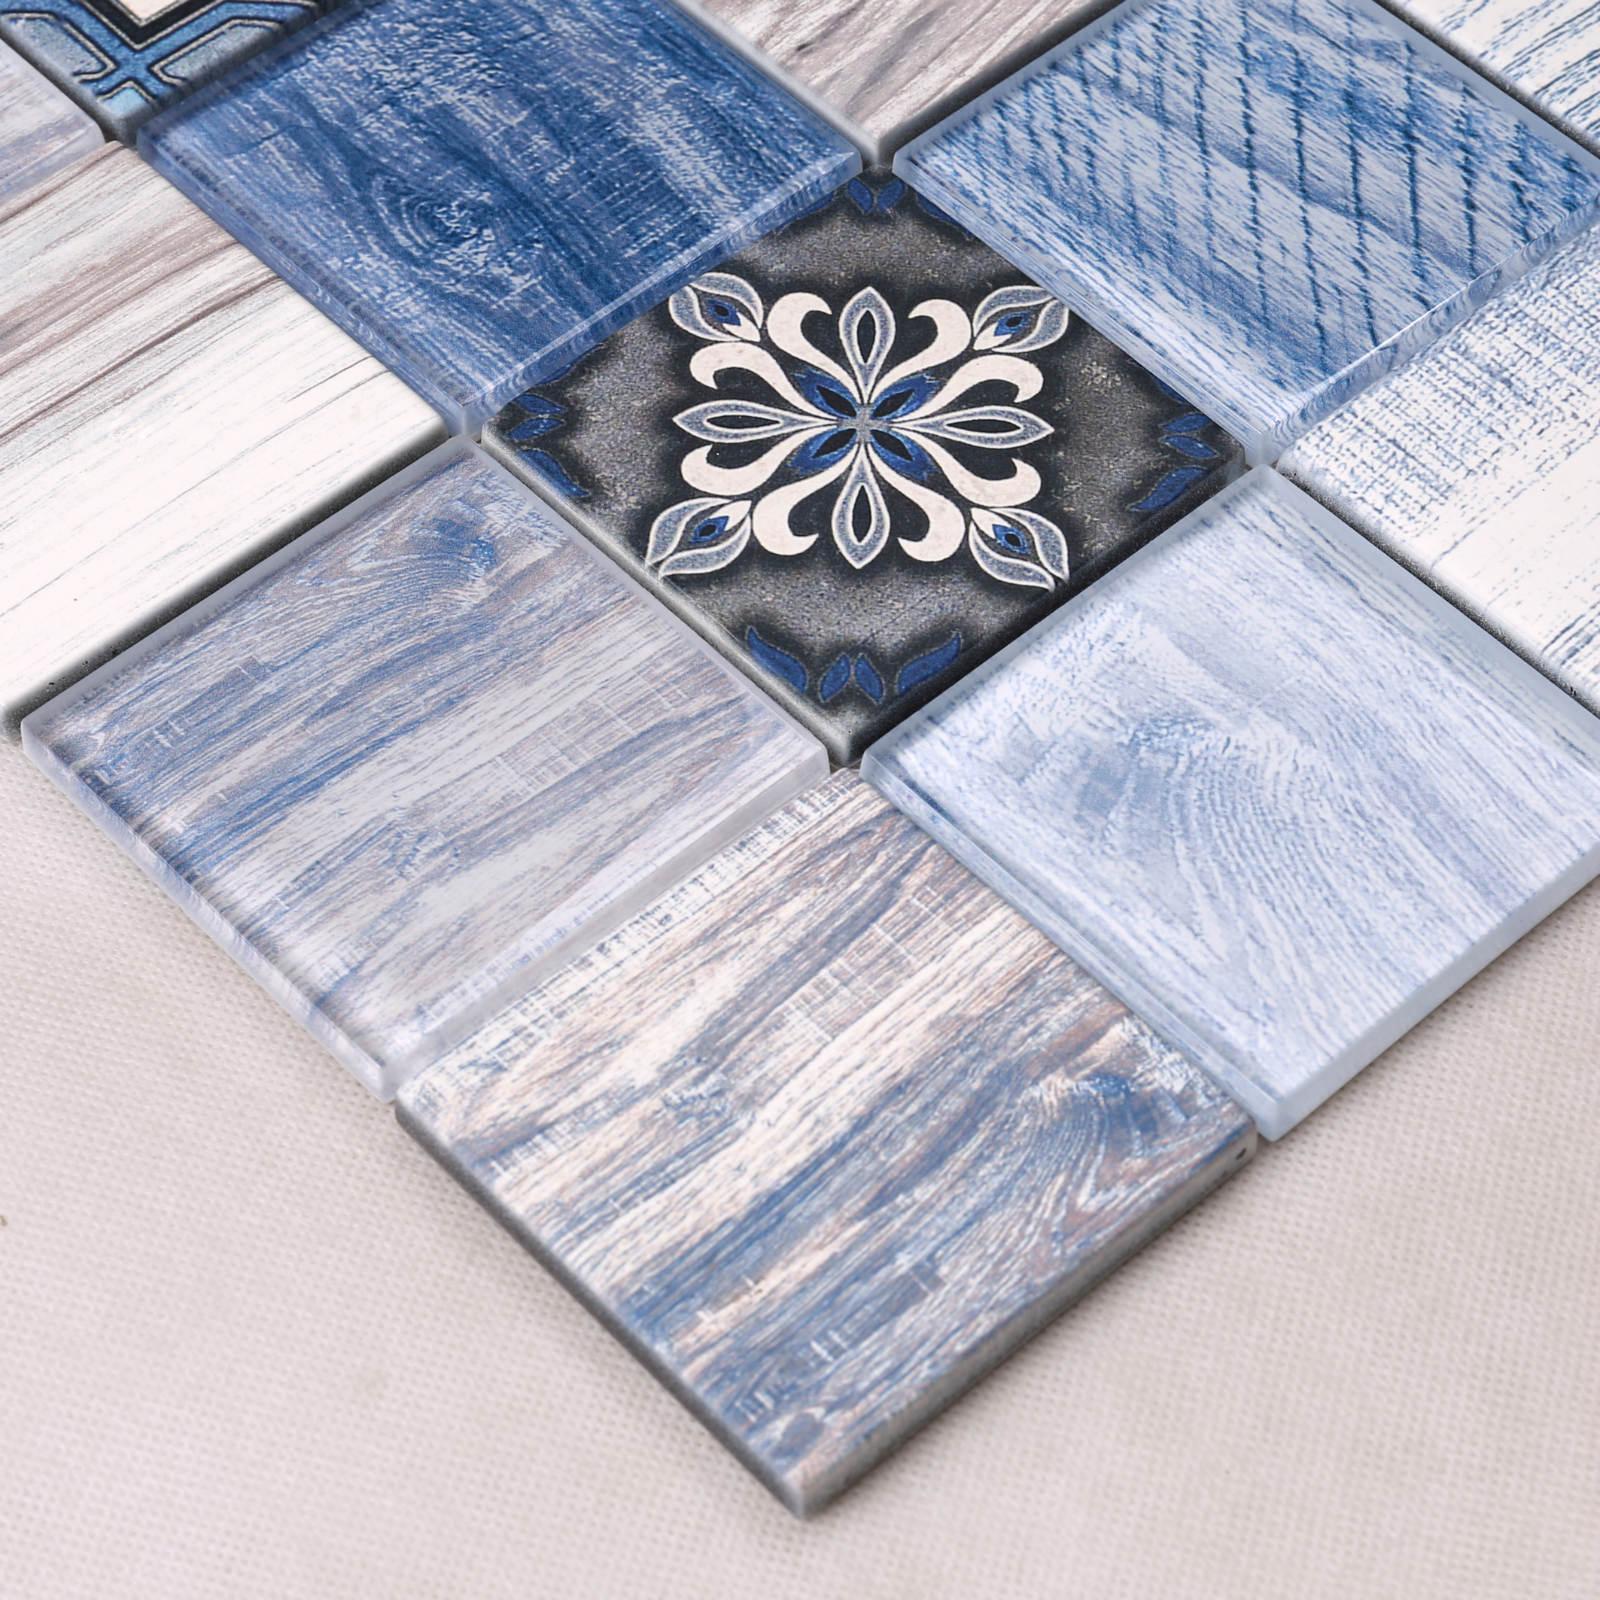 Heng Xing-Oem Green Glass Tile Manufacturer, Glass Metal Mix Mosaic Tiles | Heng Xing-2